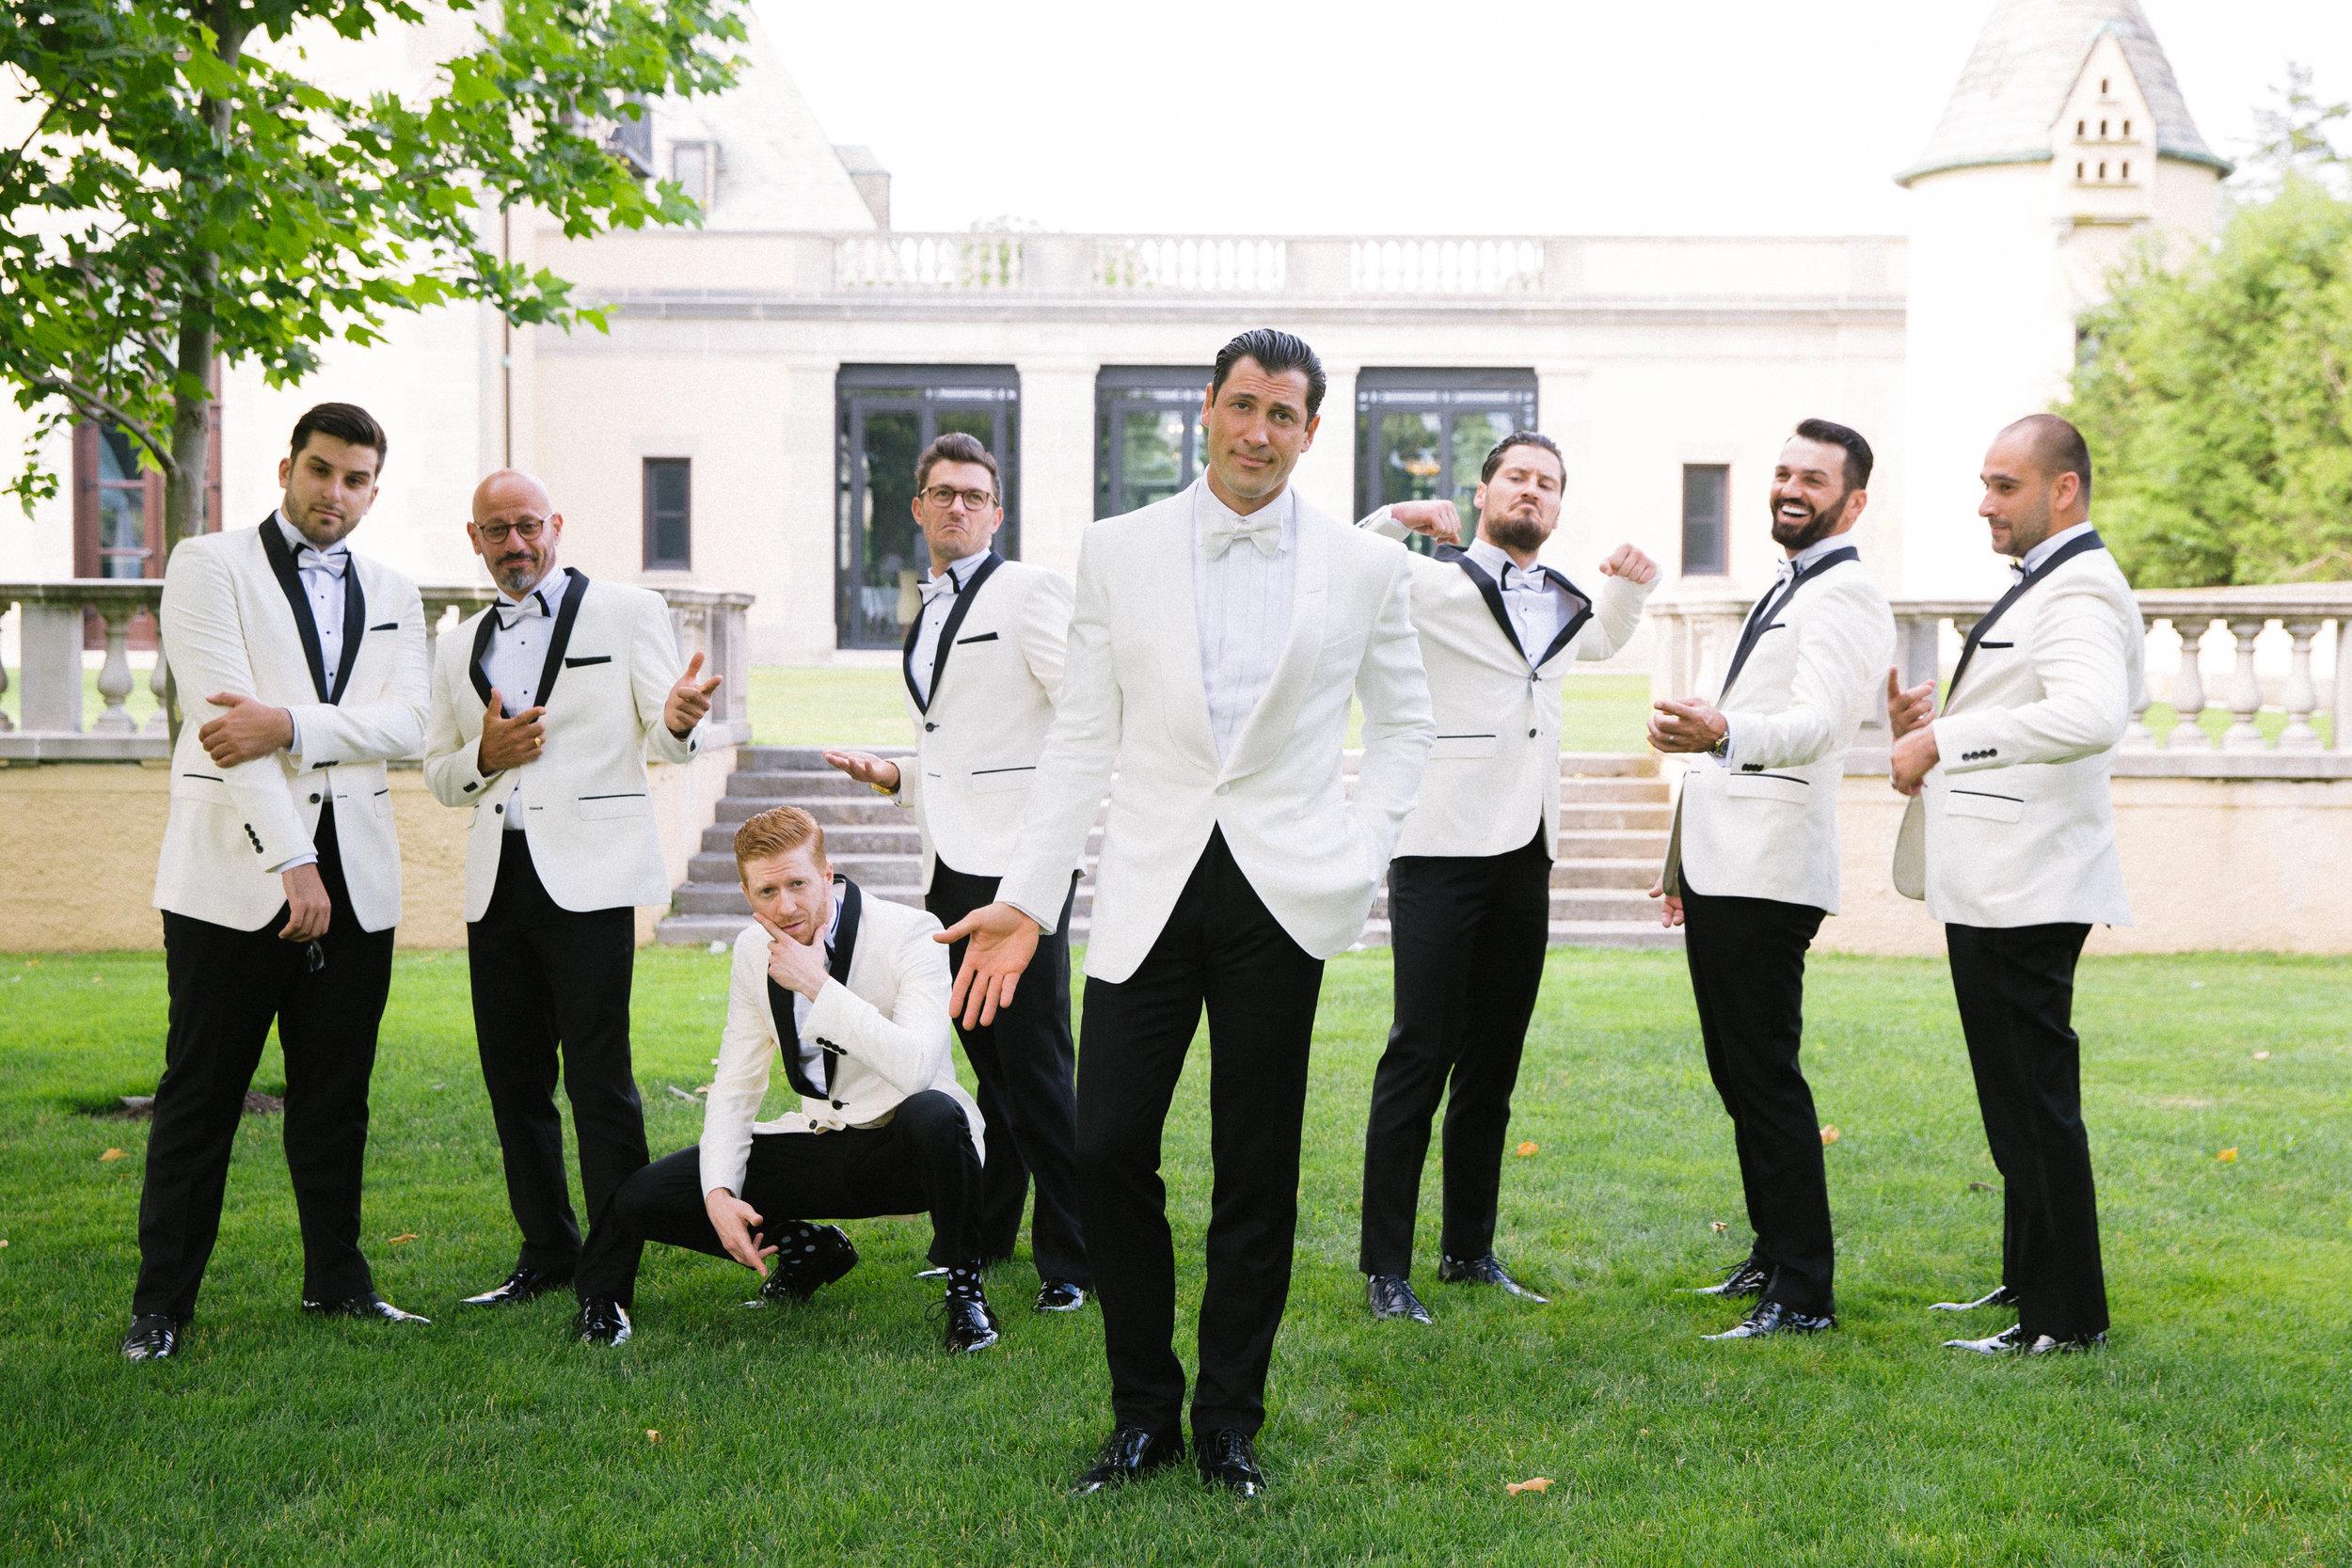 Peta Murgatroyd and Maksim Chmerkovskiy Wedding Jamie Levine Photography Oheka Castle 006.jpg